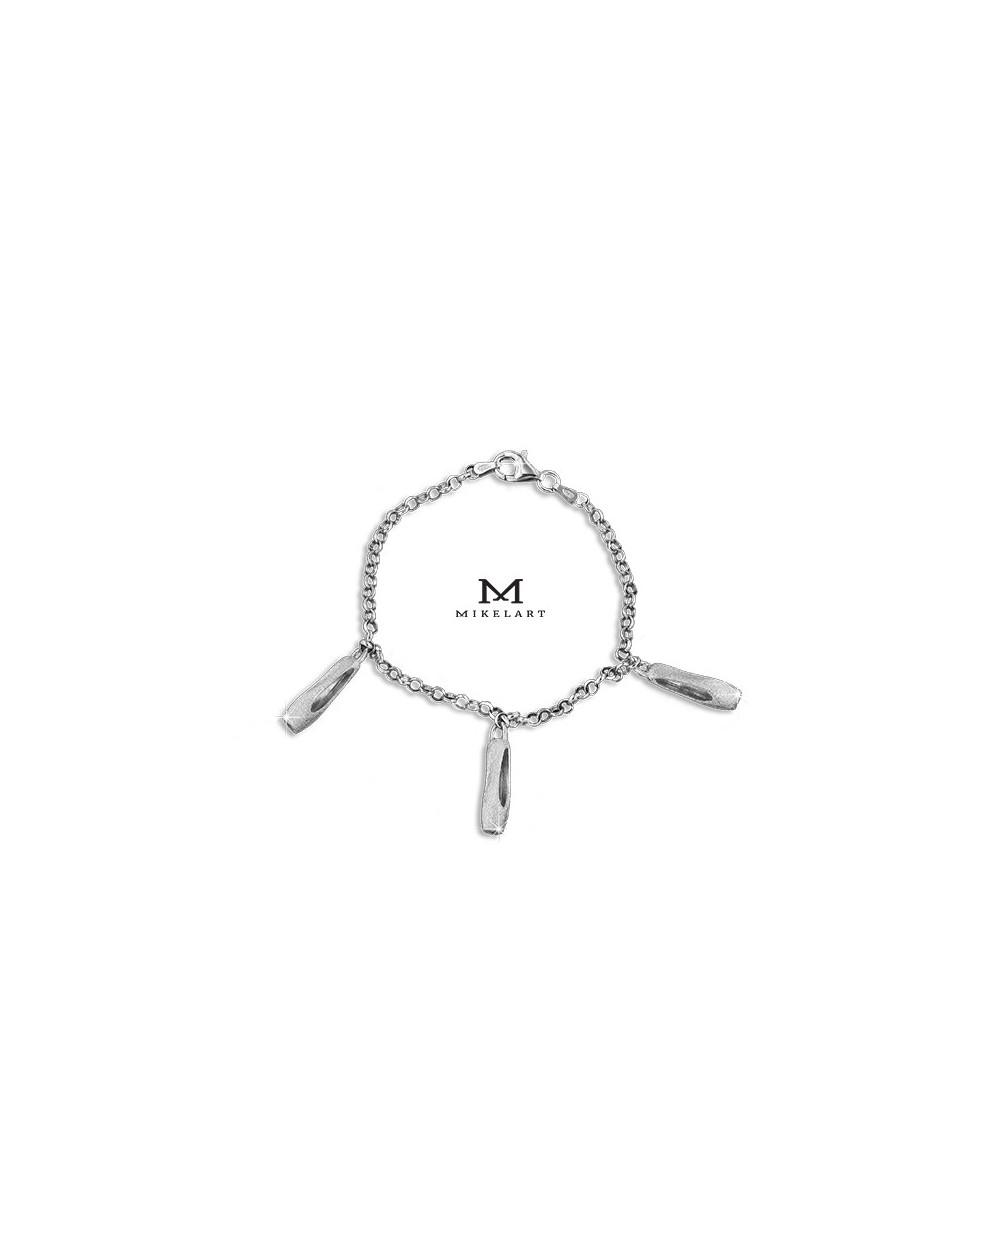 Bracelet Pointes Mikelart